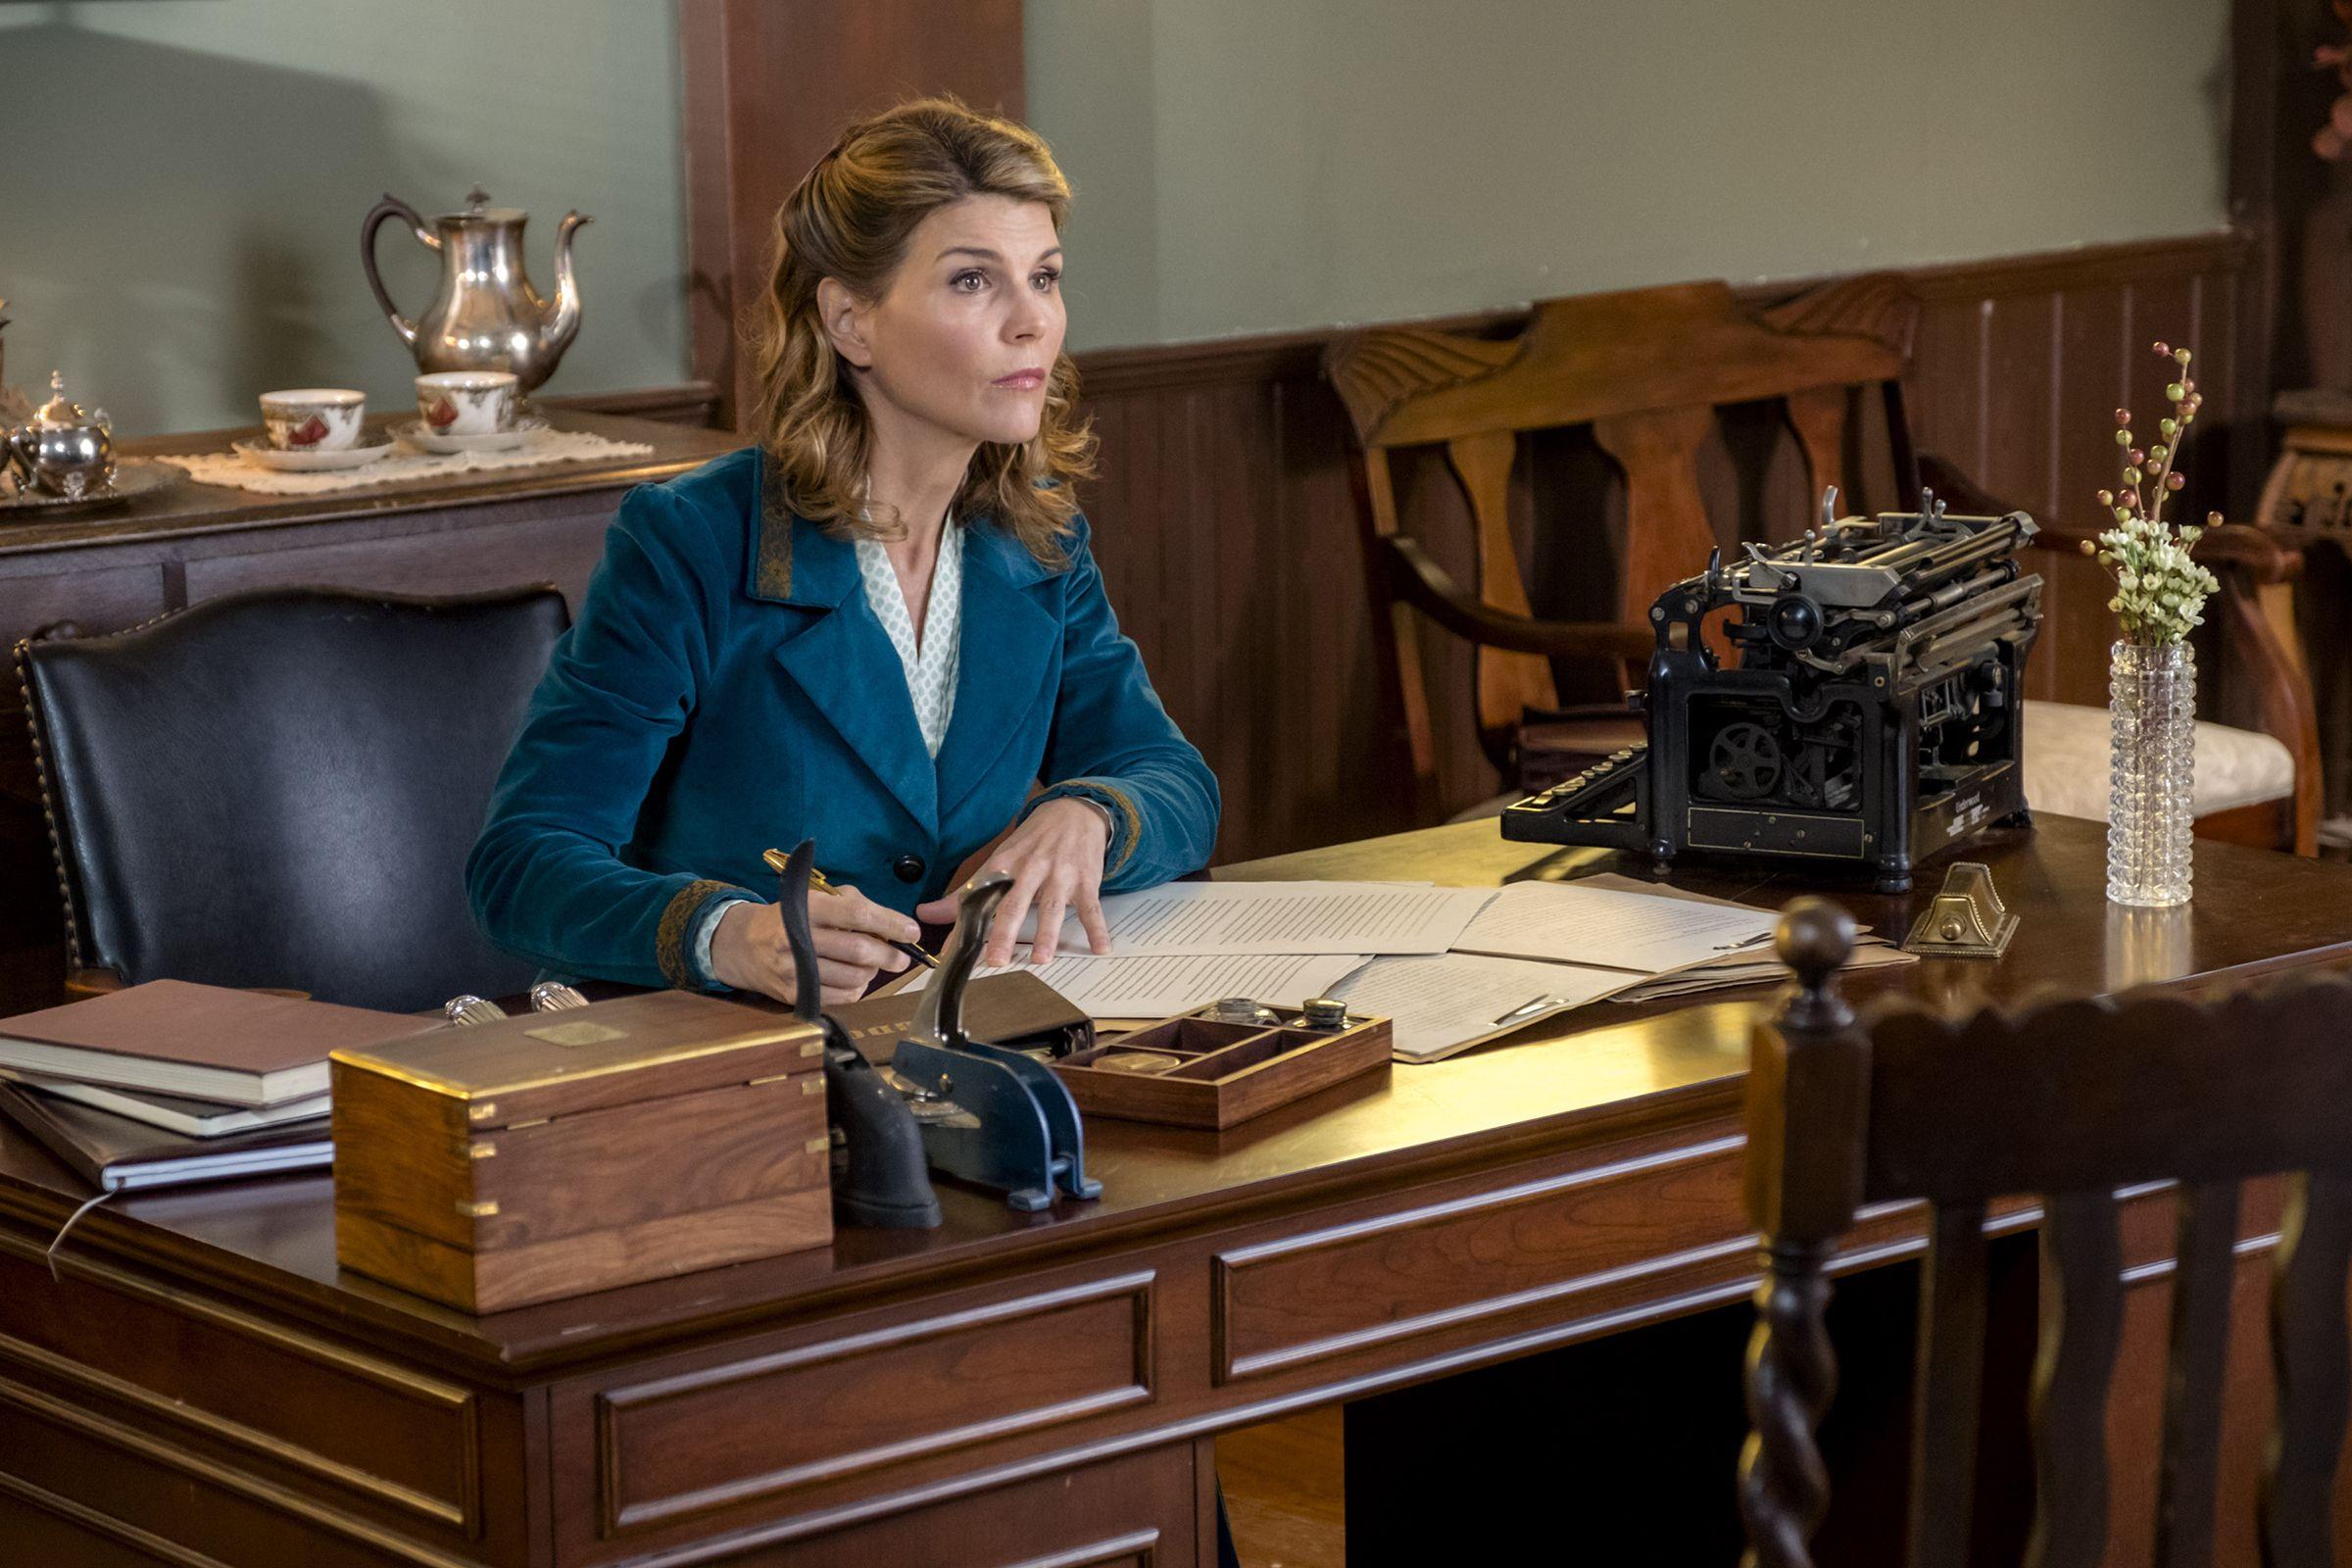 'When Calls the Heart' Cast Breaks Their Silence Following the Lori Loughlin Scandal